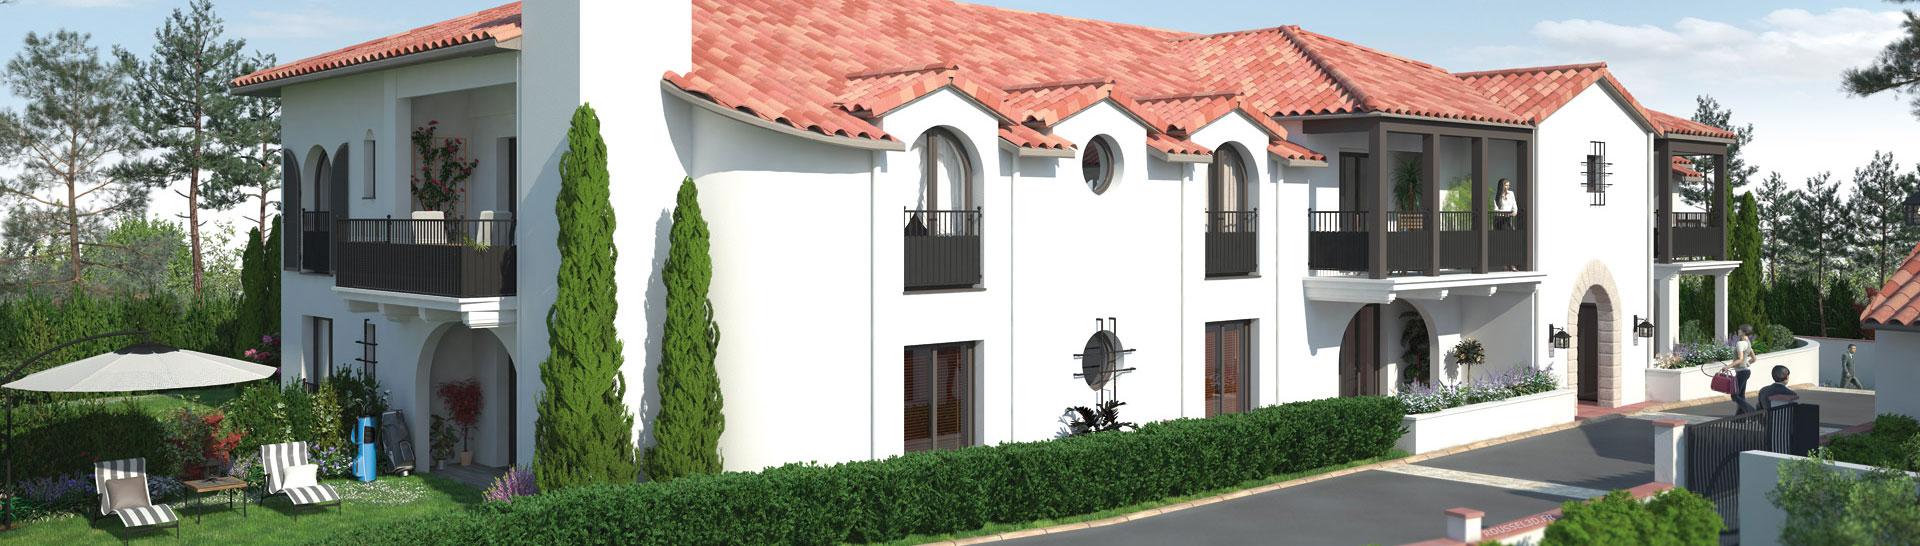 residence-neuve-anglet-chiberta-acheter-appartement-neuf-anglet-chiberta